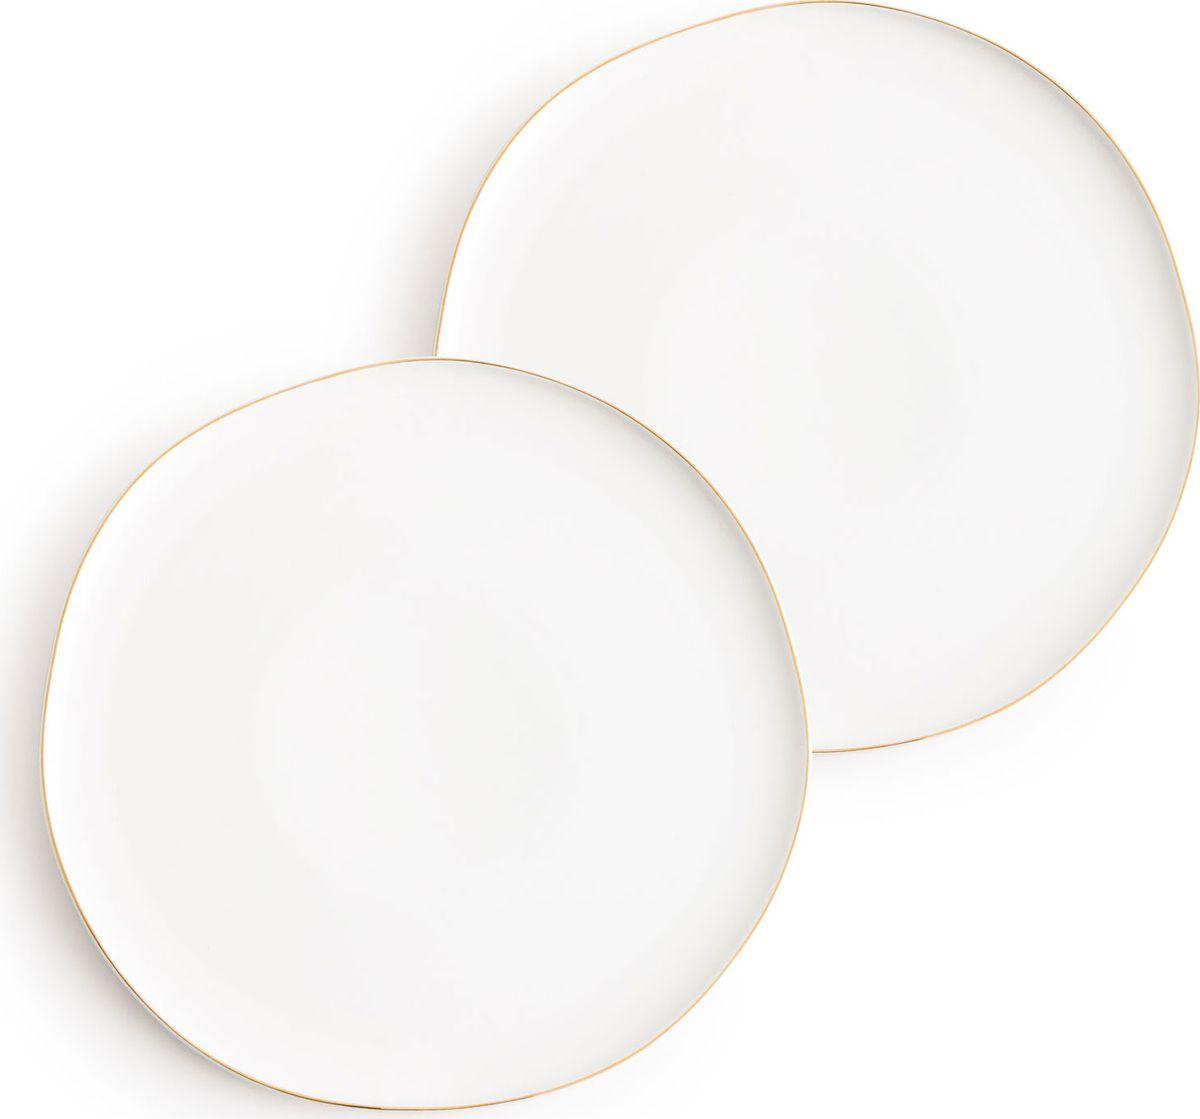 Набор тарелок Rosanna Pacifica, 2 шт96923